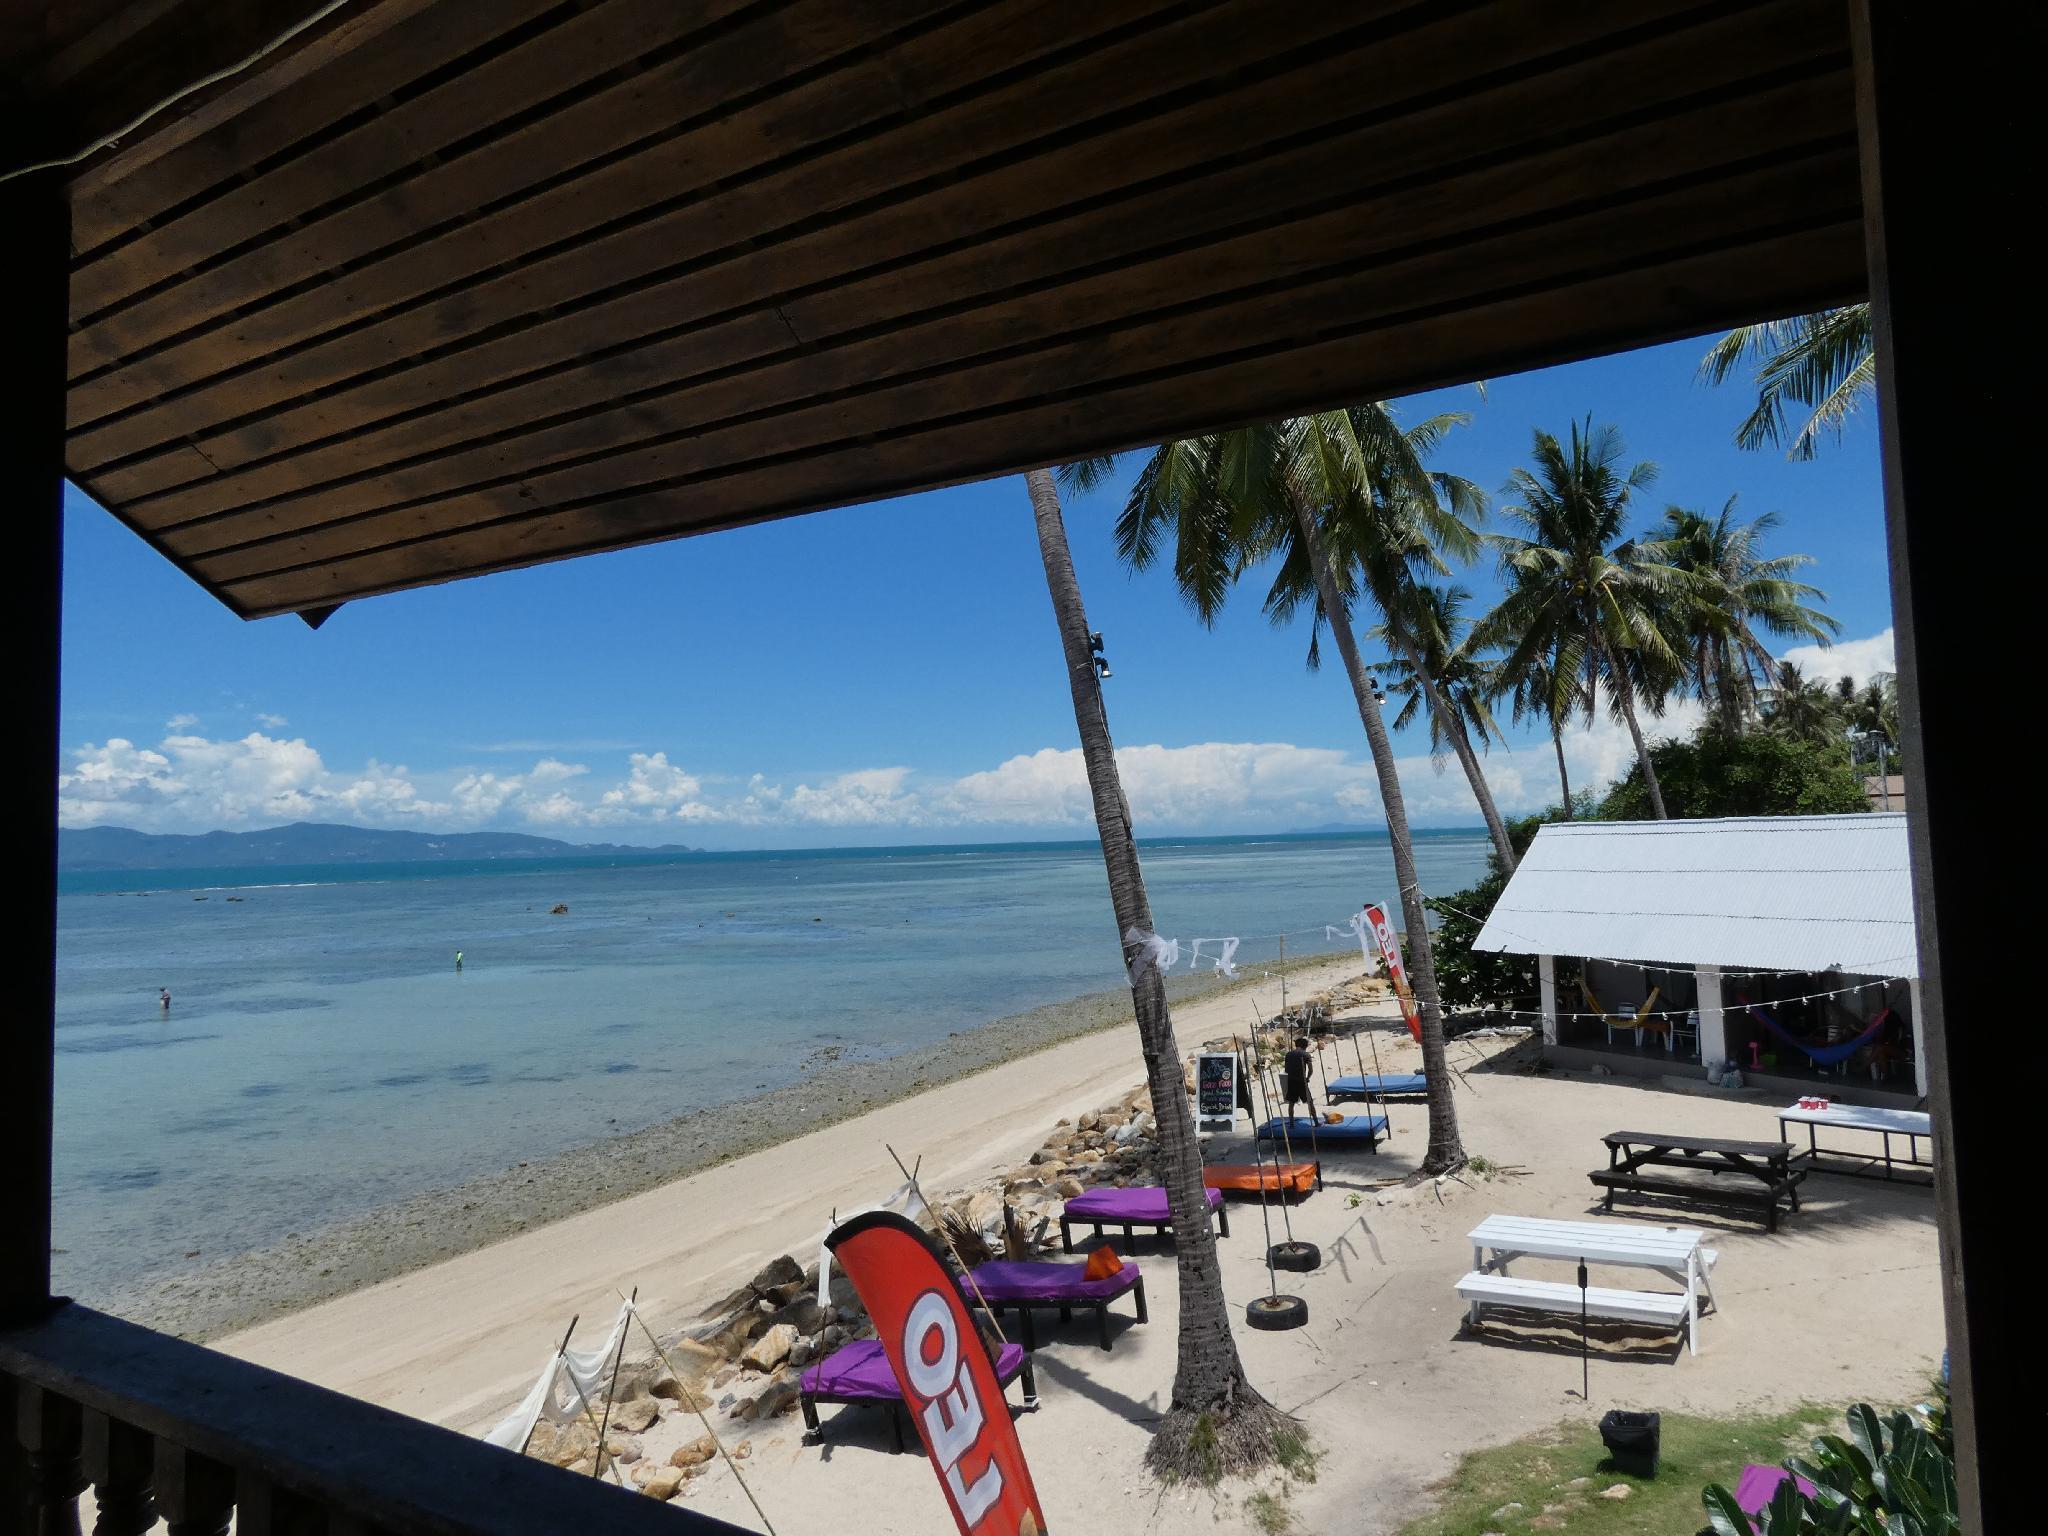 Asia Blue Beach Hostel Hacienda, Ko Phangan